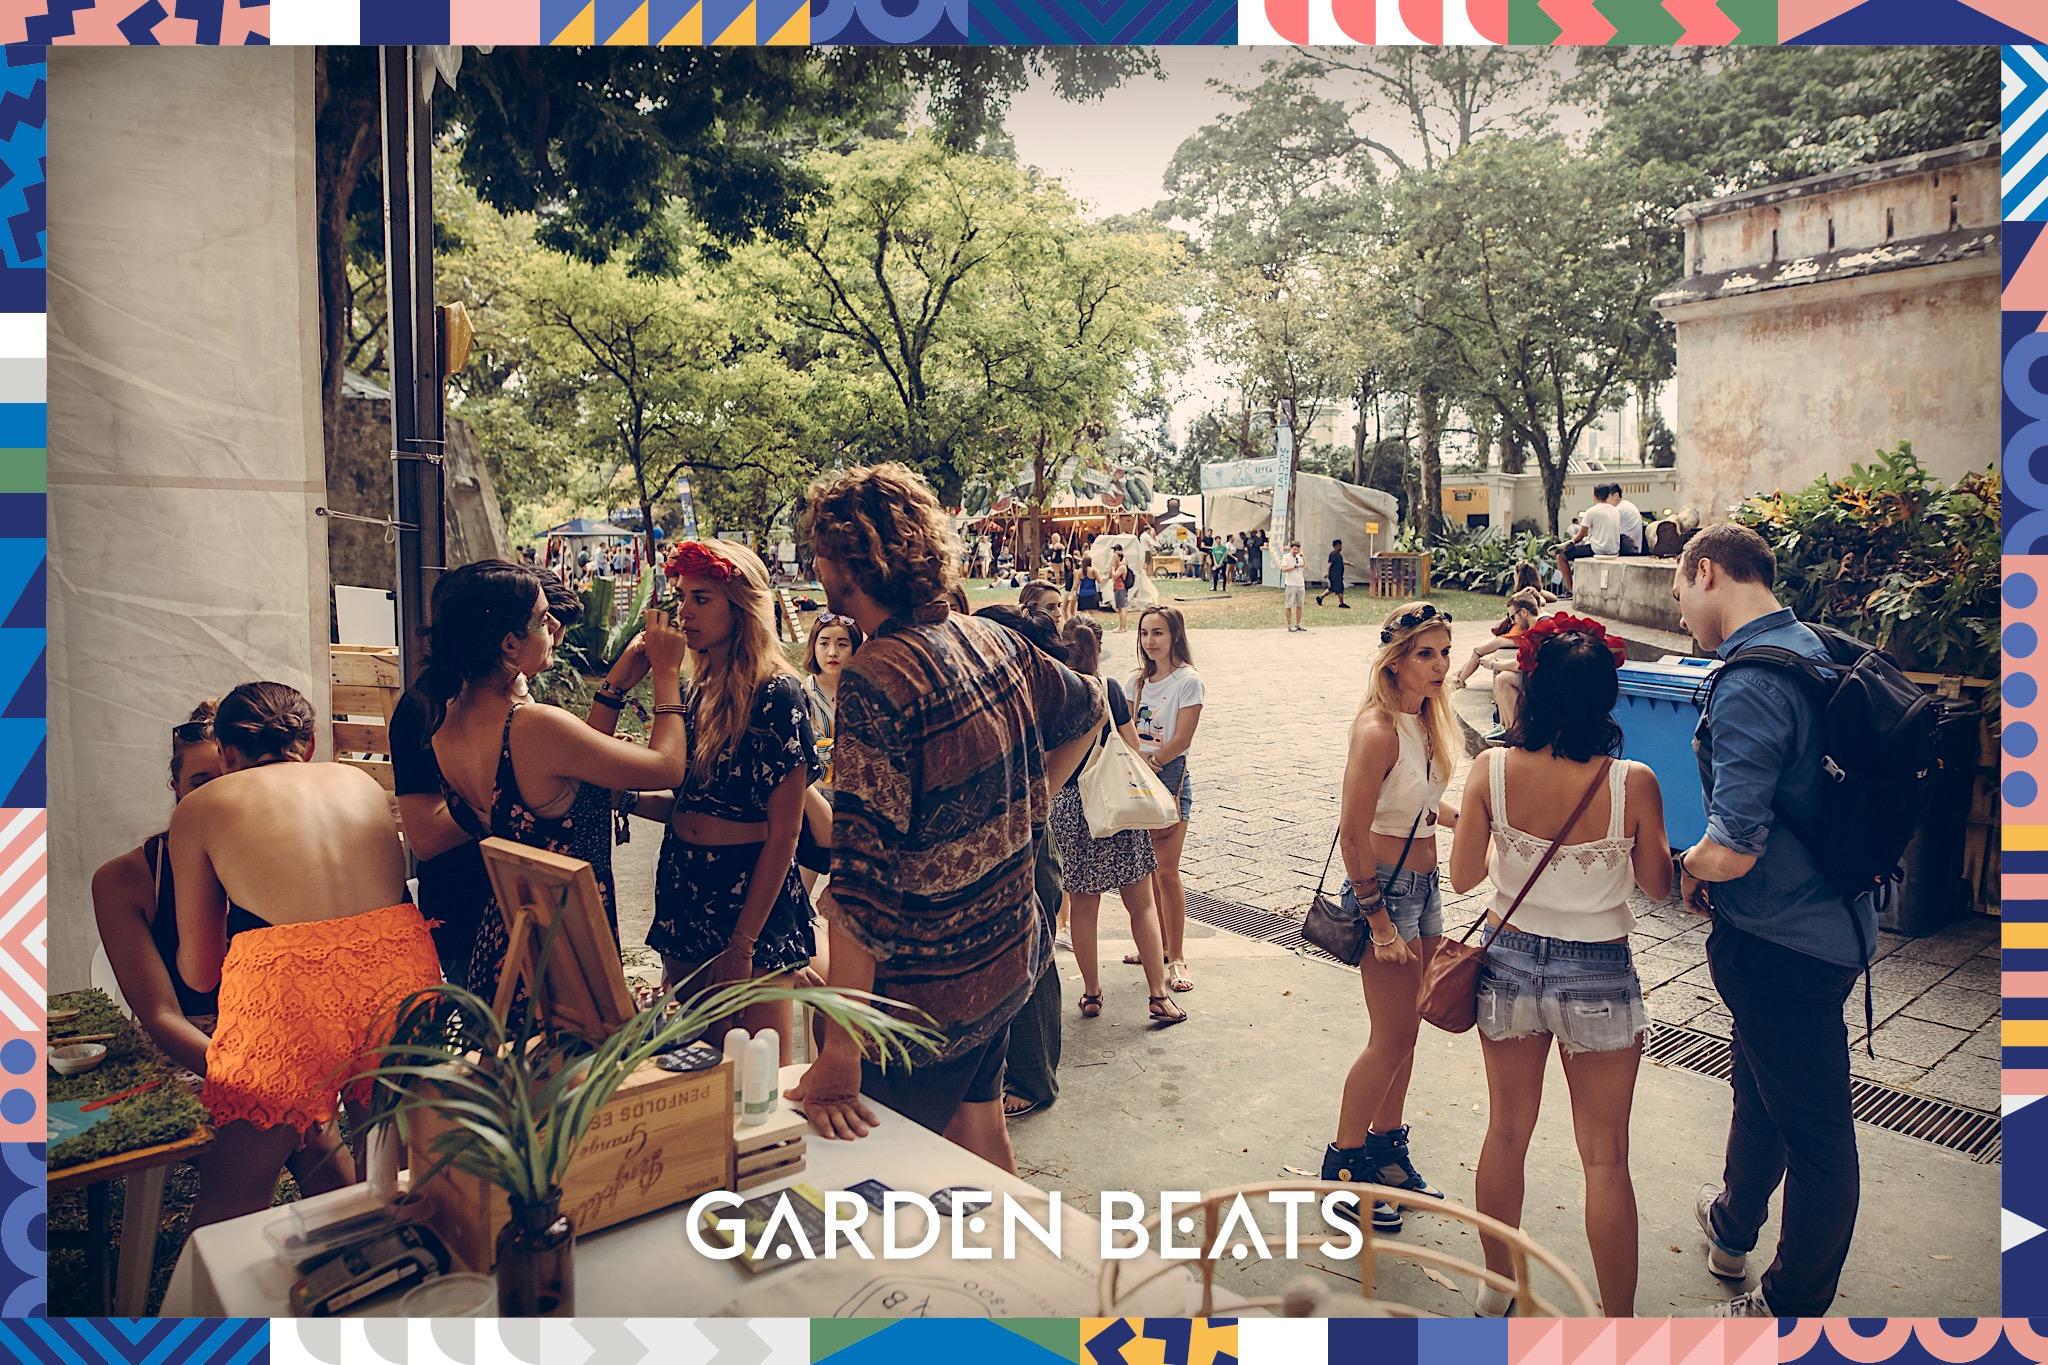 03032018_GardenBeats_Colossal353_Watermarked.jpg